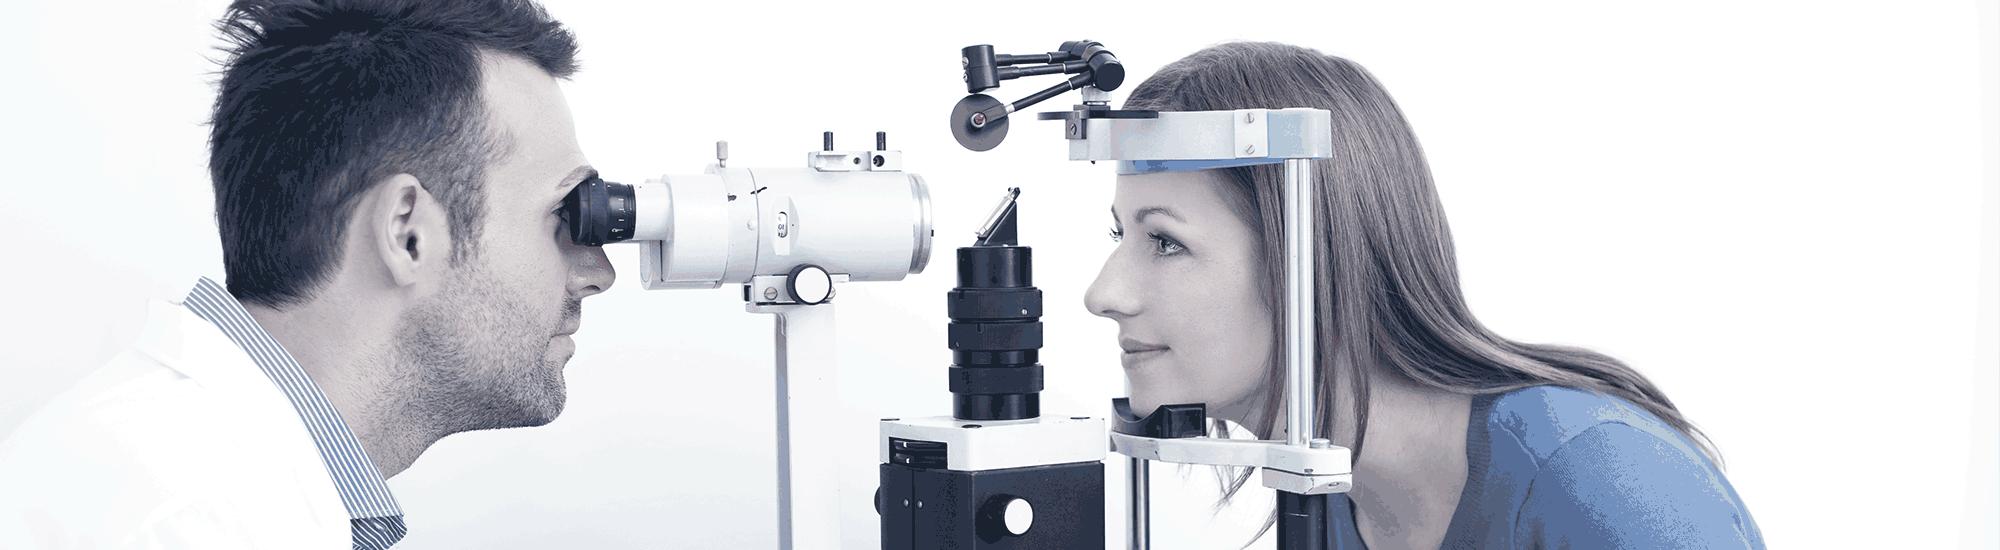 Optician professional liability insurance